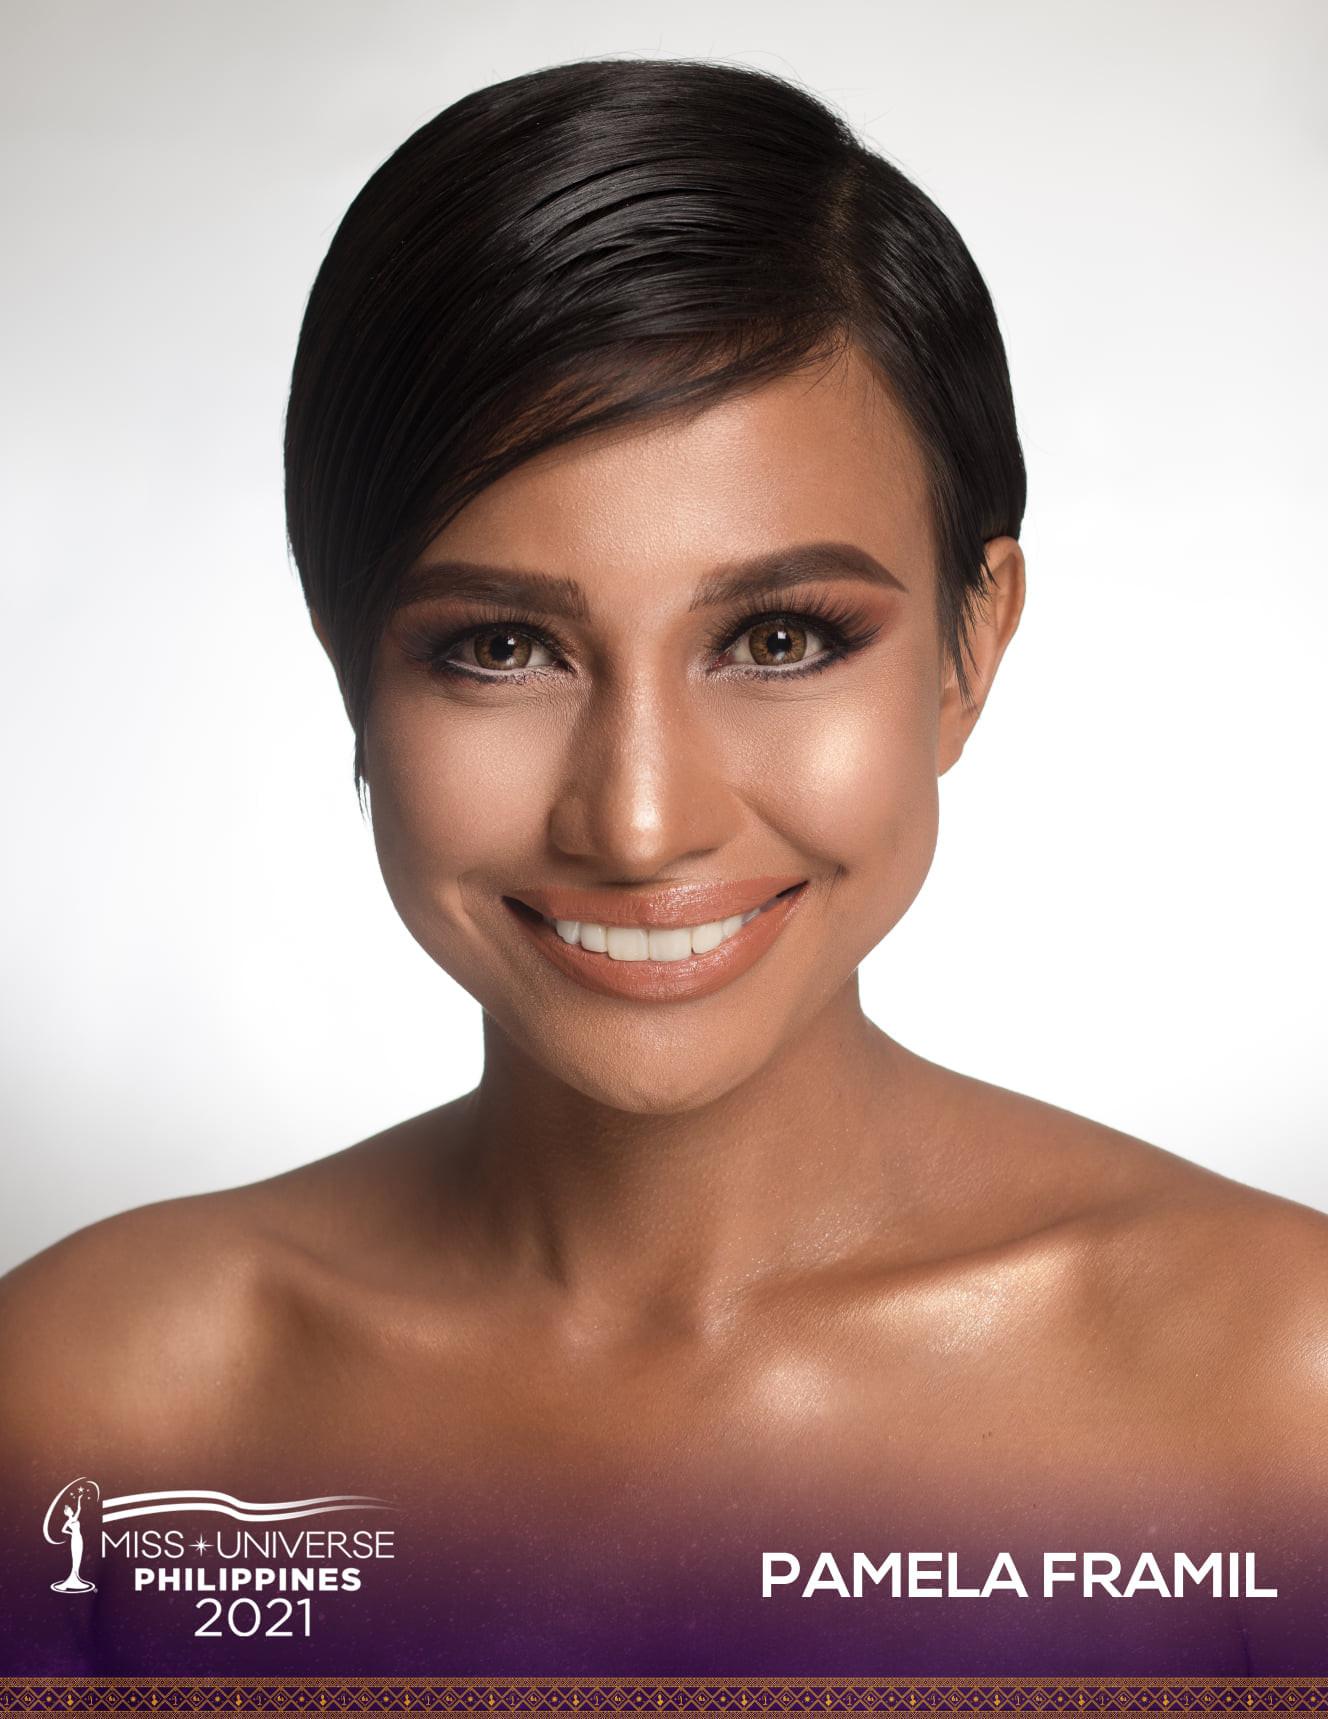 pre-candidatas a miss universe philippines 2021. - Página 7 AlMV2V